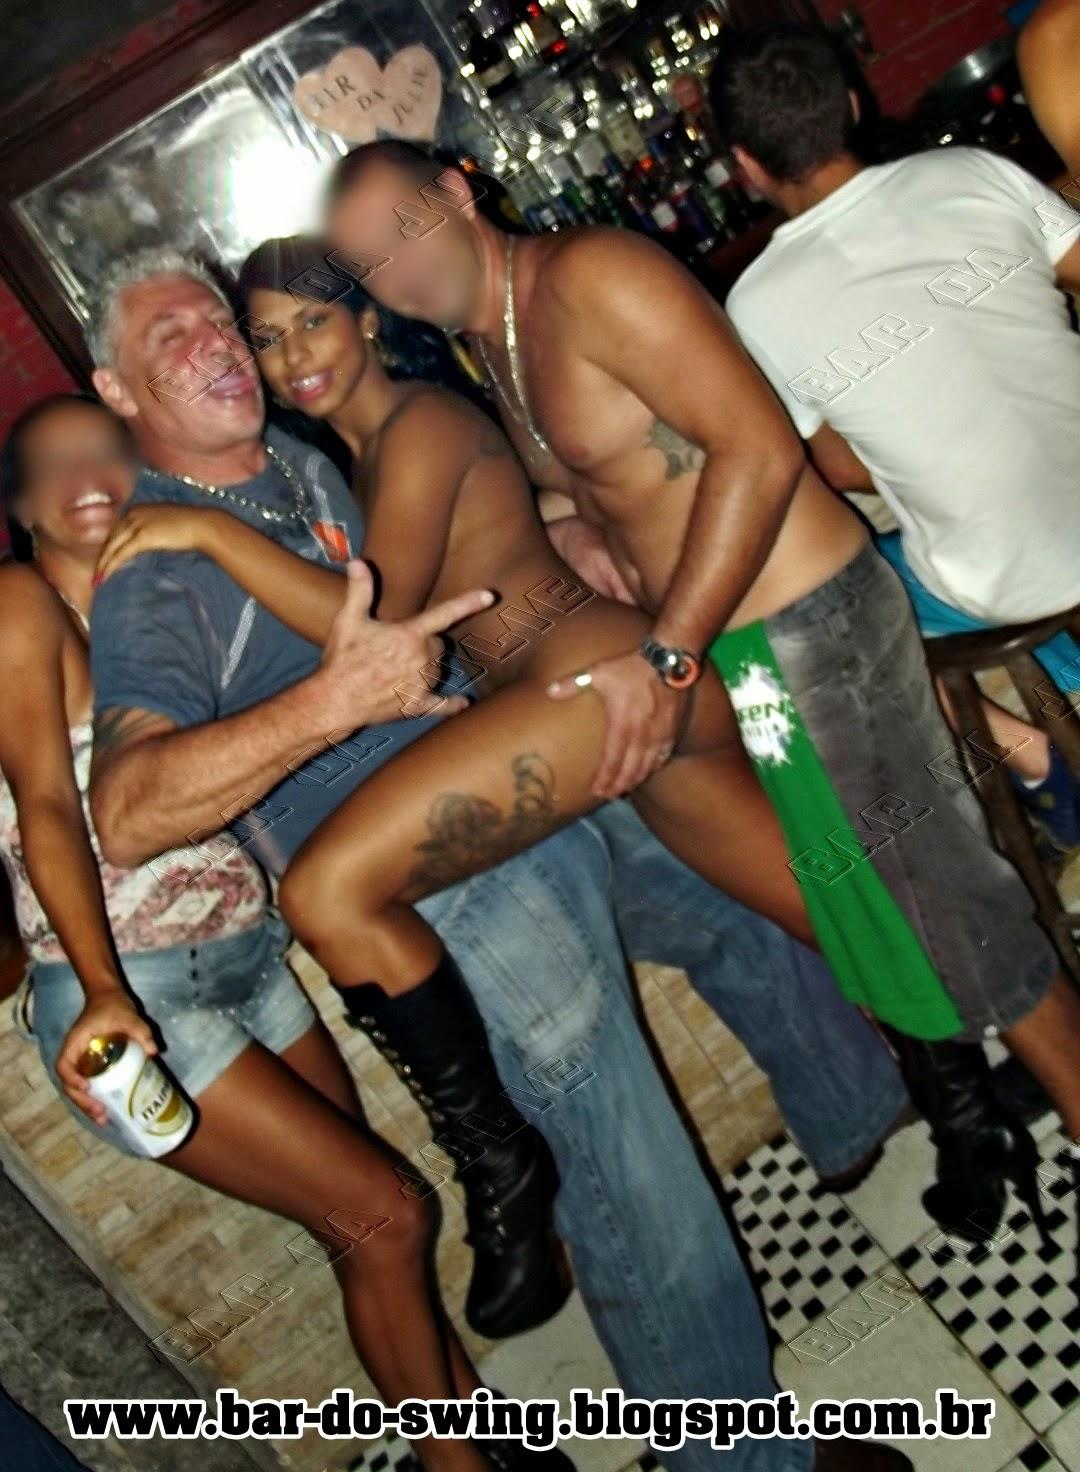 Bar swinger colombia, midget having group sex